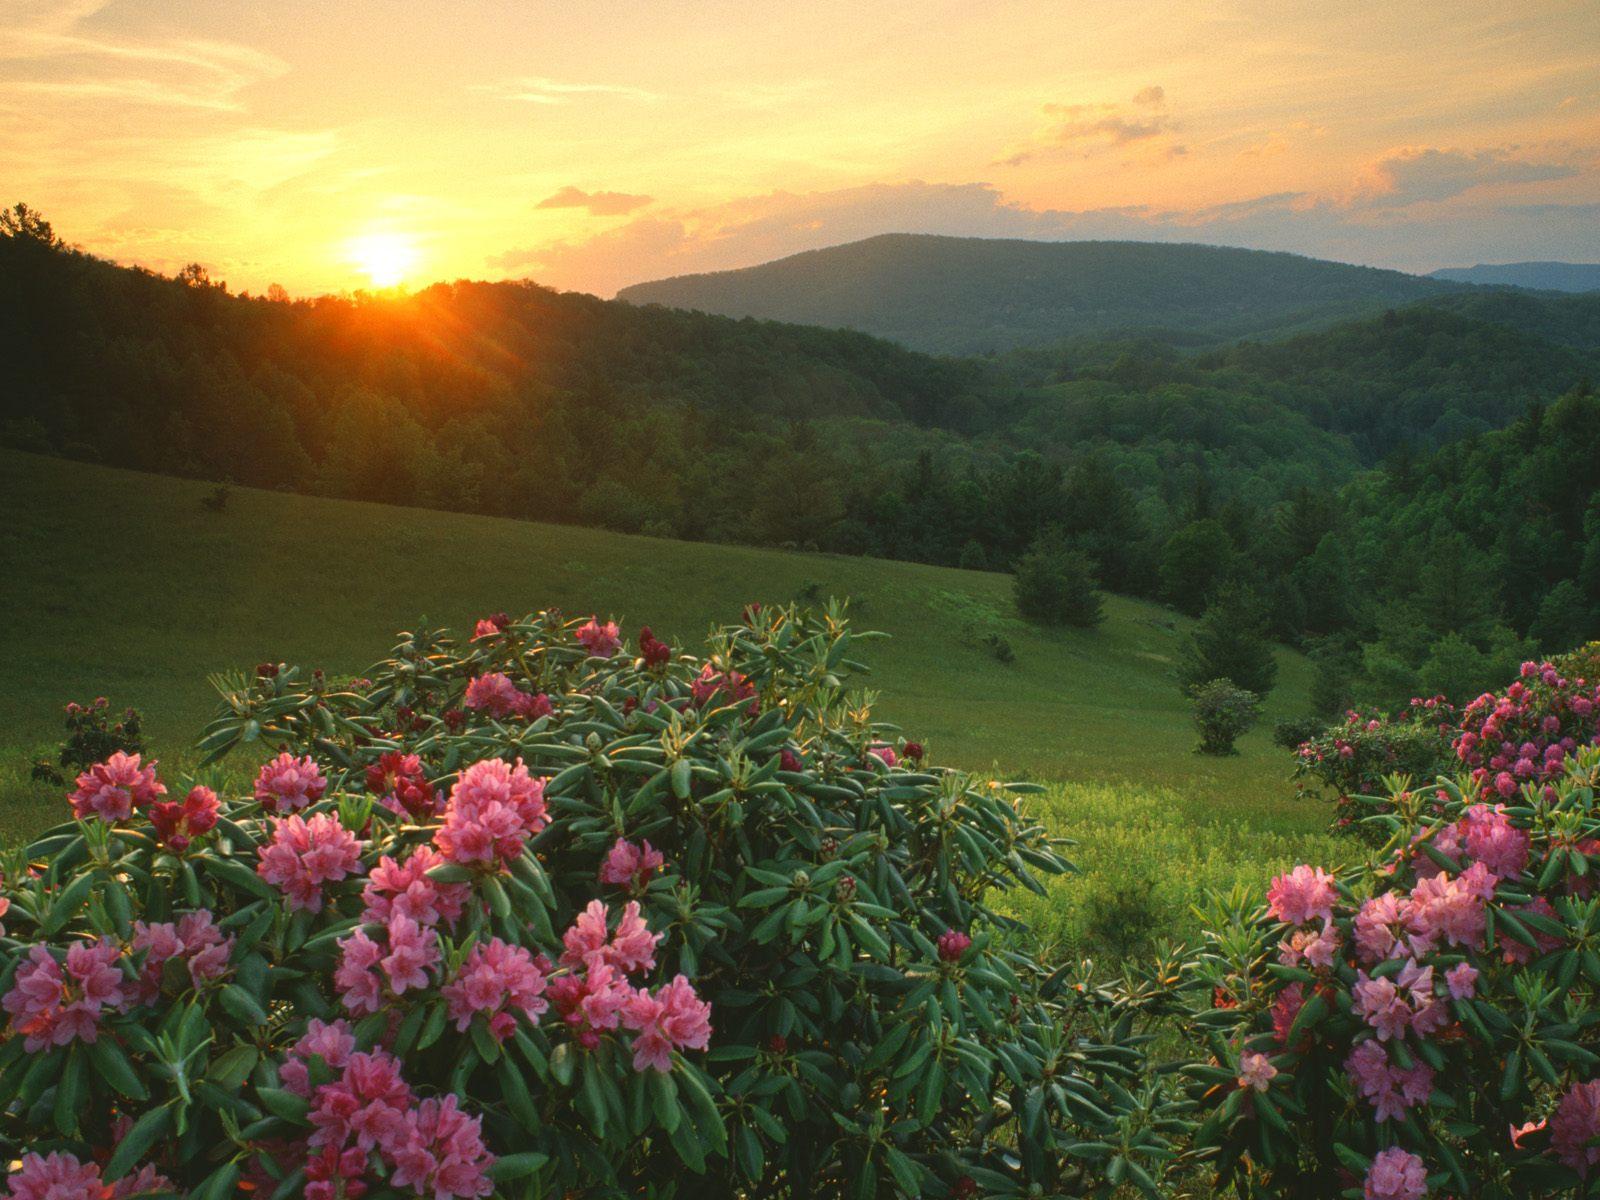 Rhododendrons at Sunrise, Moses H. Cone Memorial Park, North Carolina